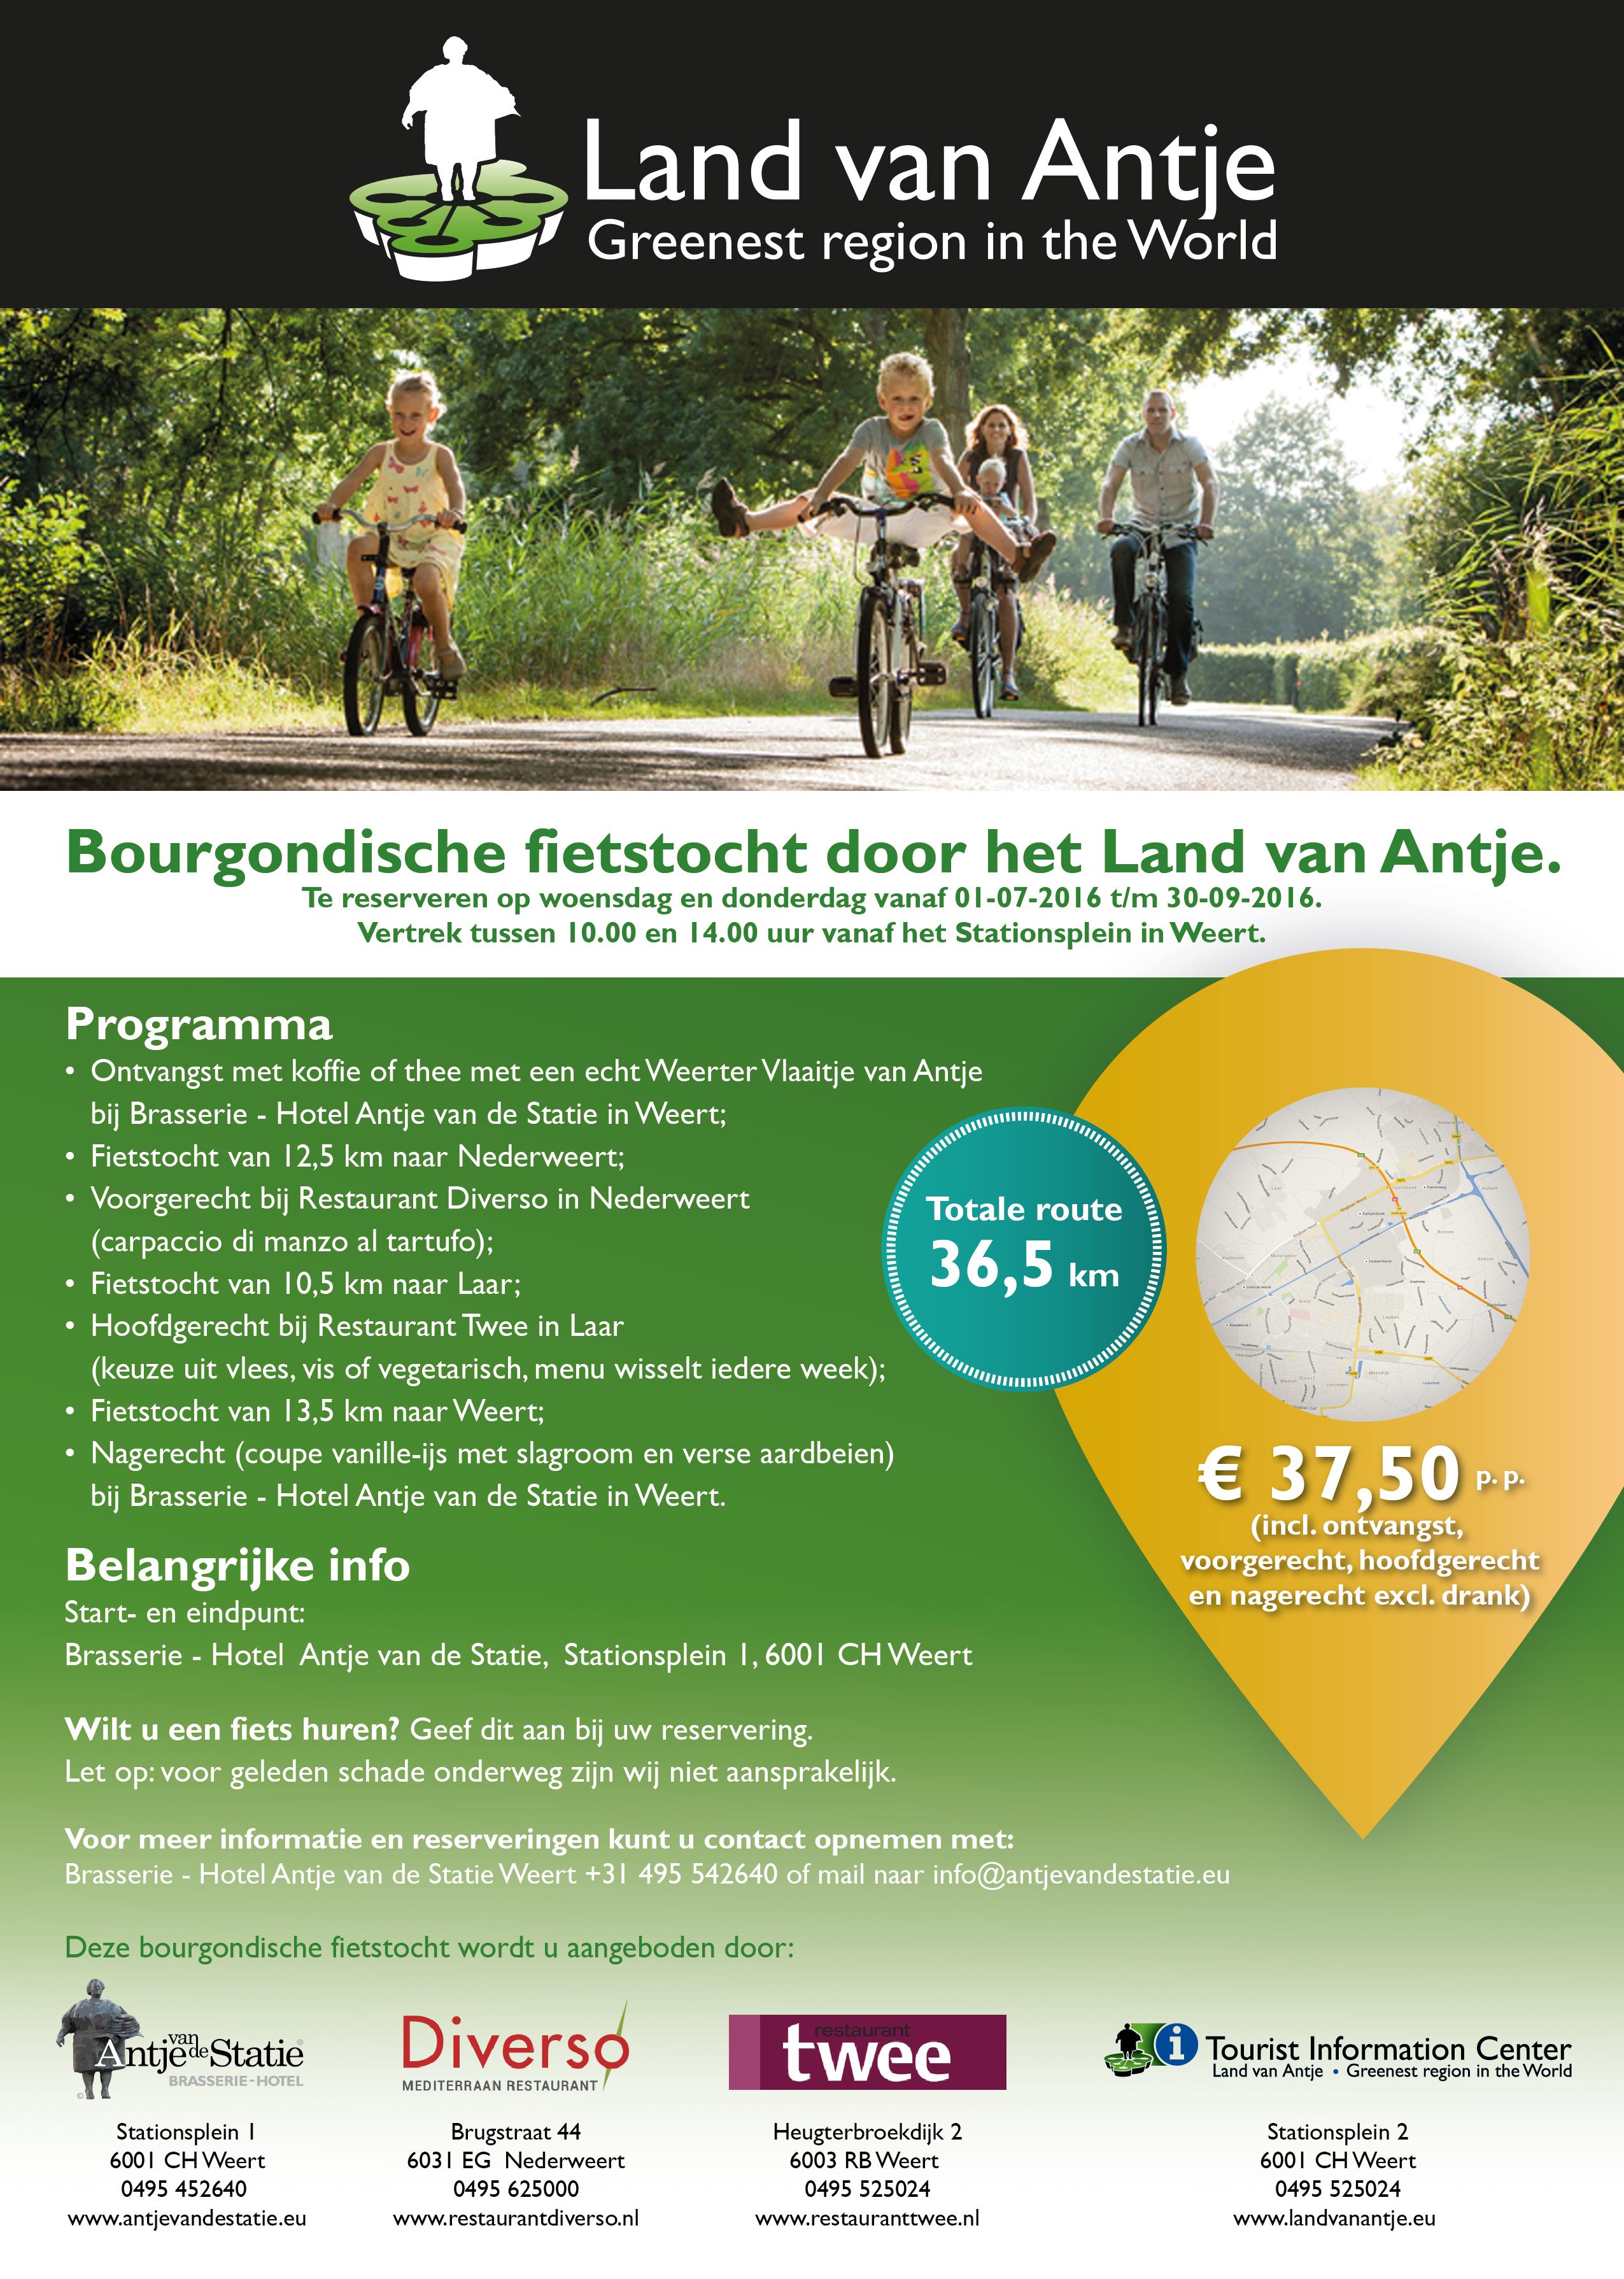 Bourgondische fietsroute